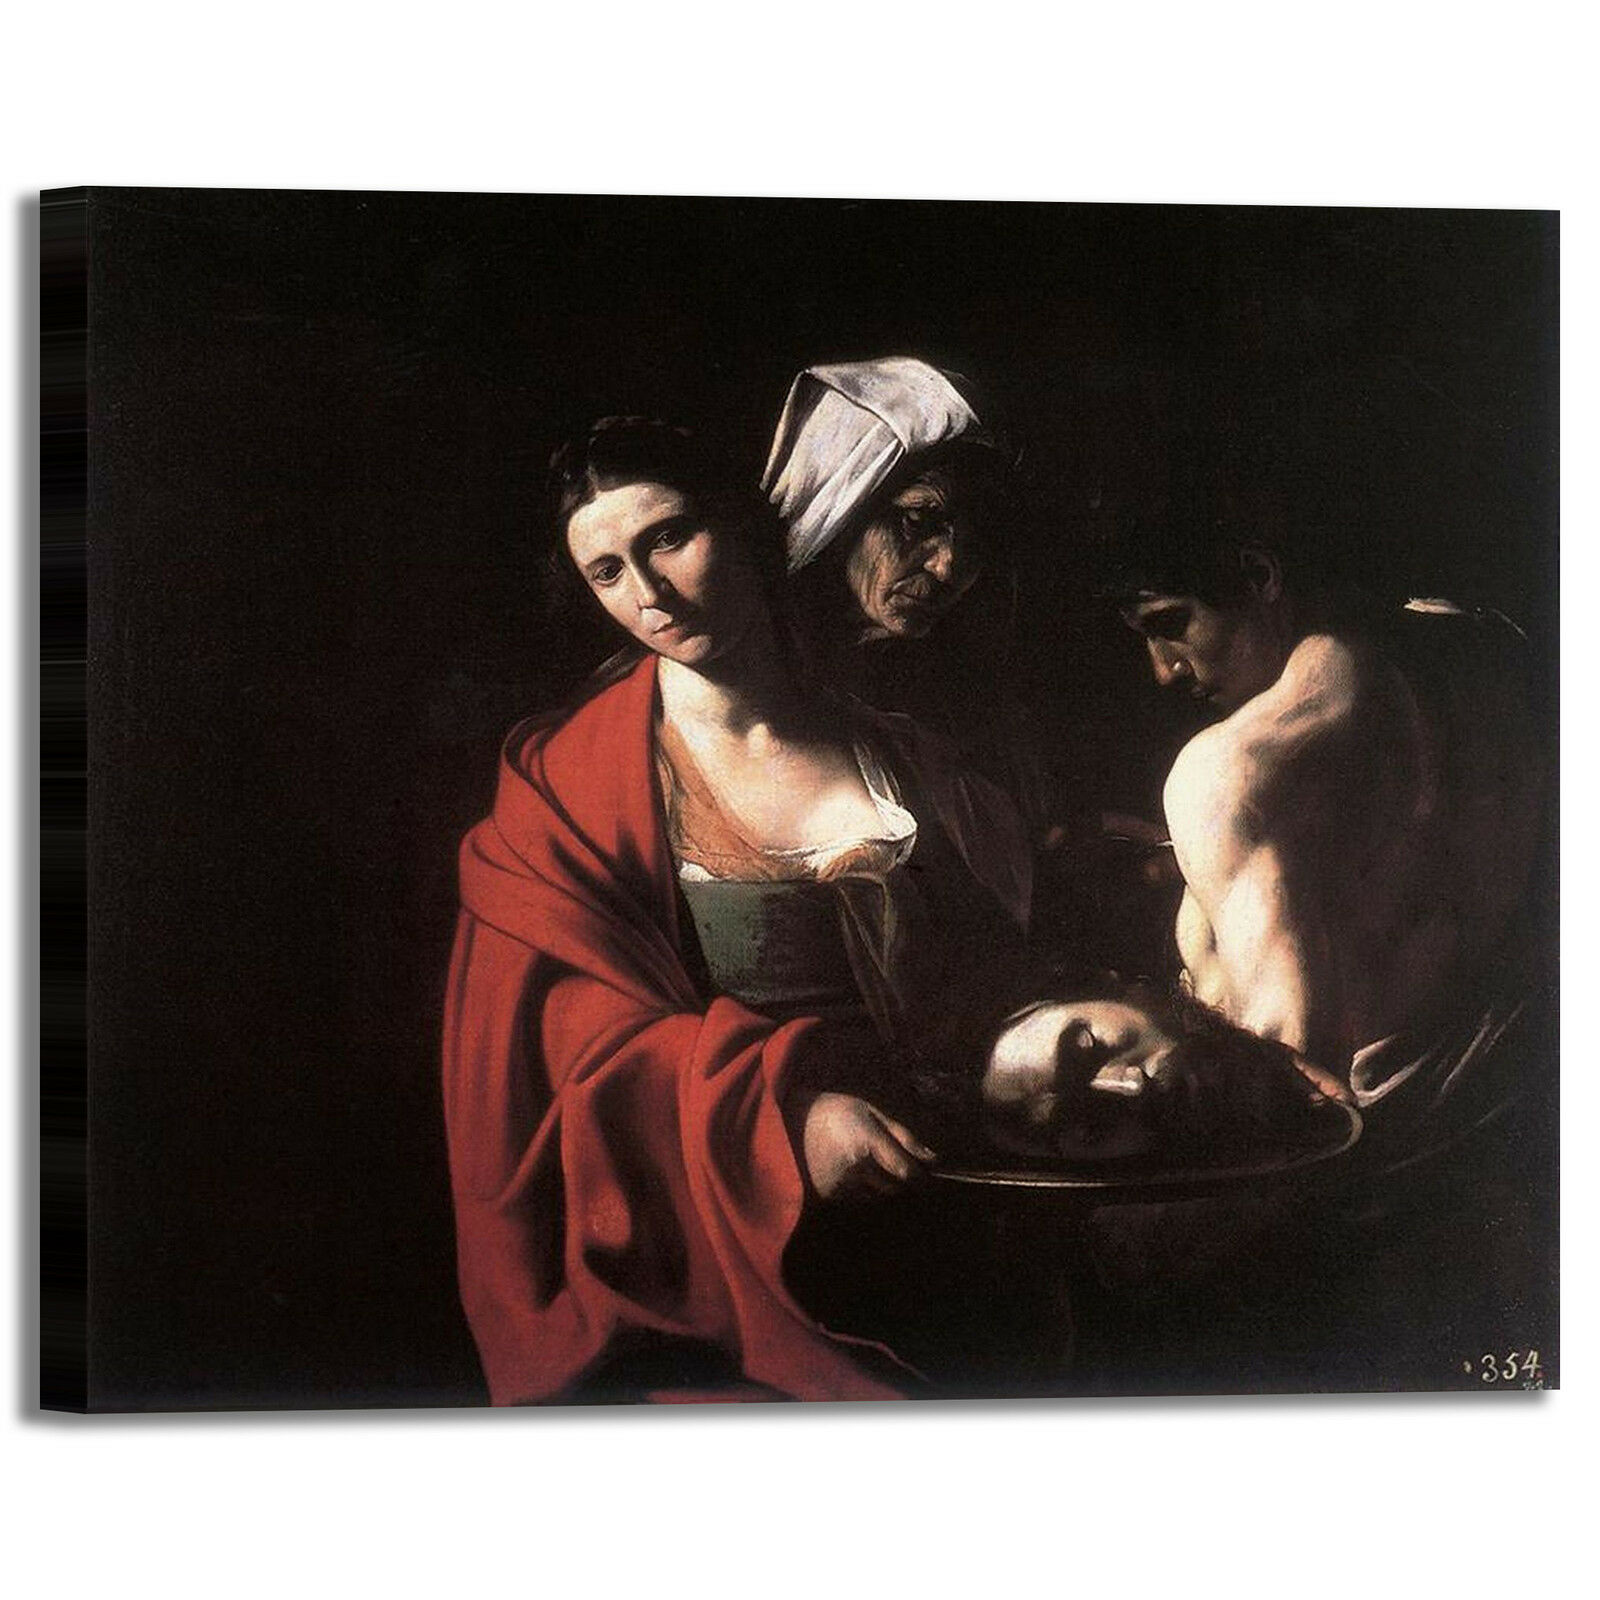 Caravaggio Salomè testa con la testa Salomè Battista quadro stampa tela dipinto arRouge o casa 525712